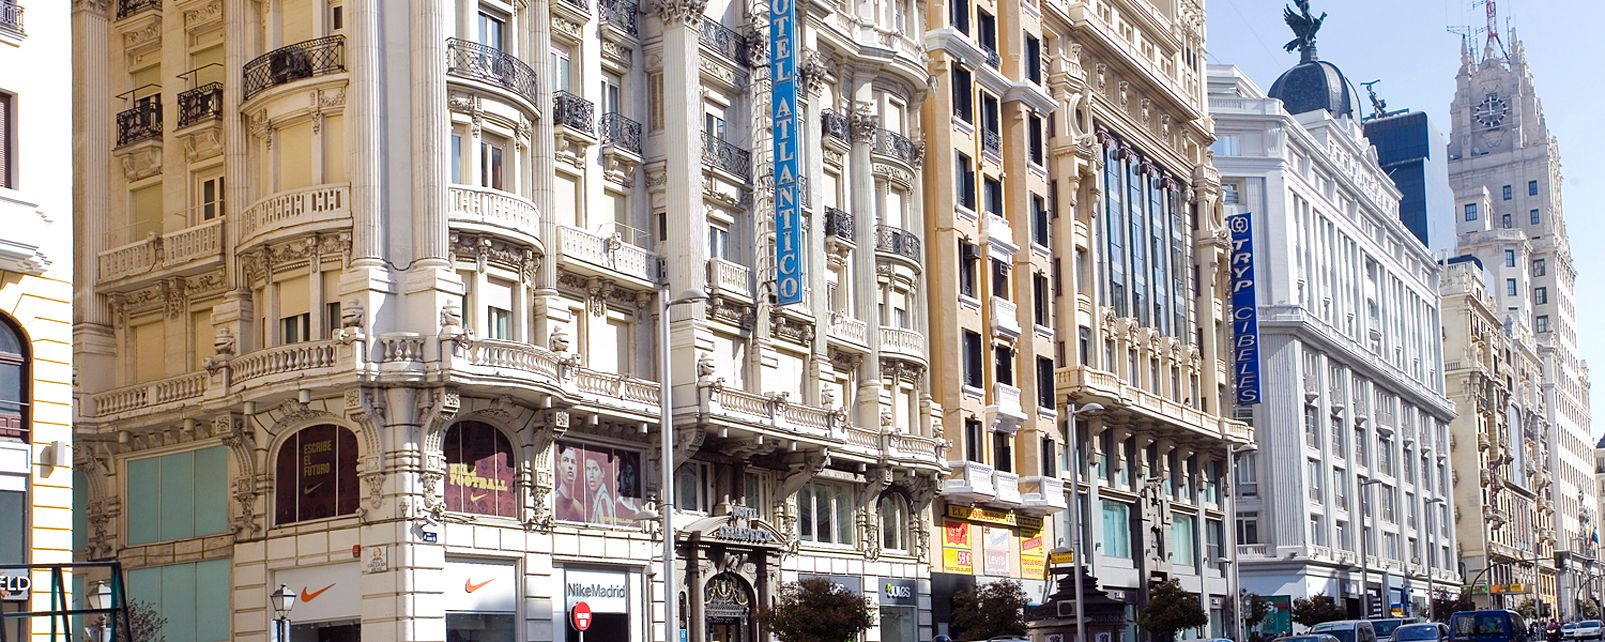 Hotel Atl Ntico In Madrid Spain